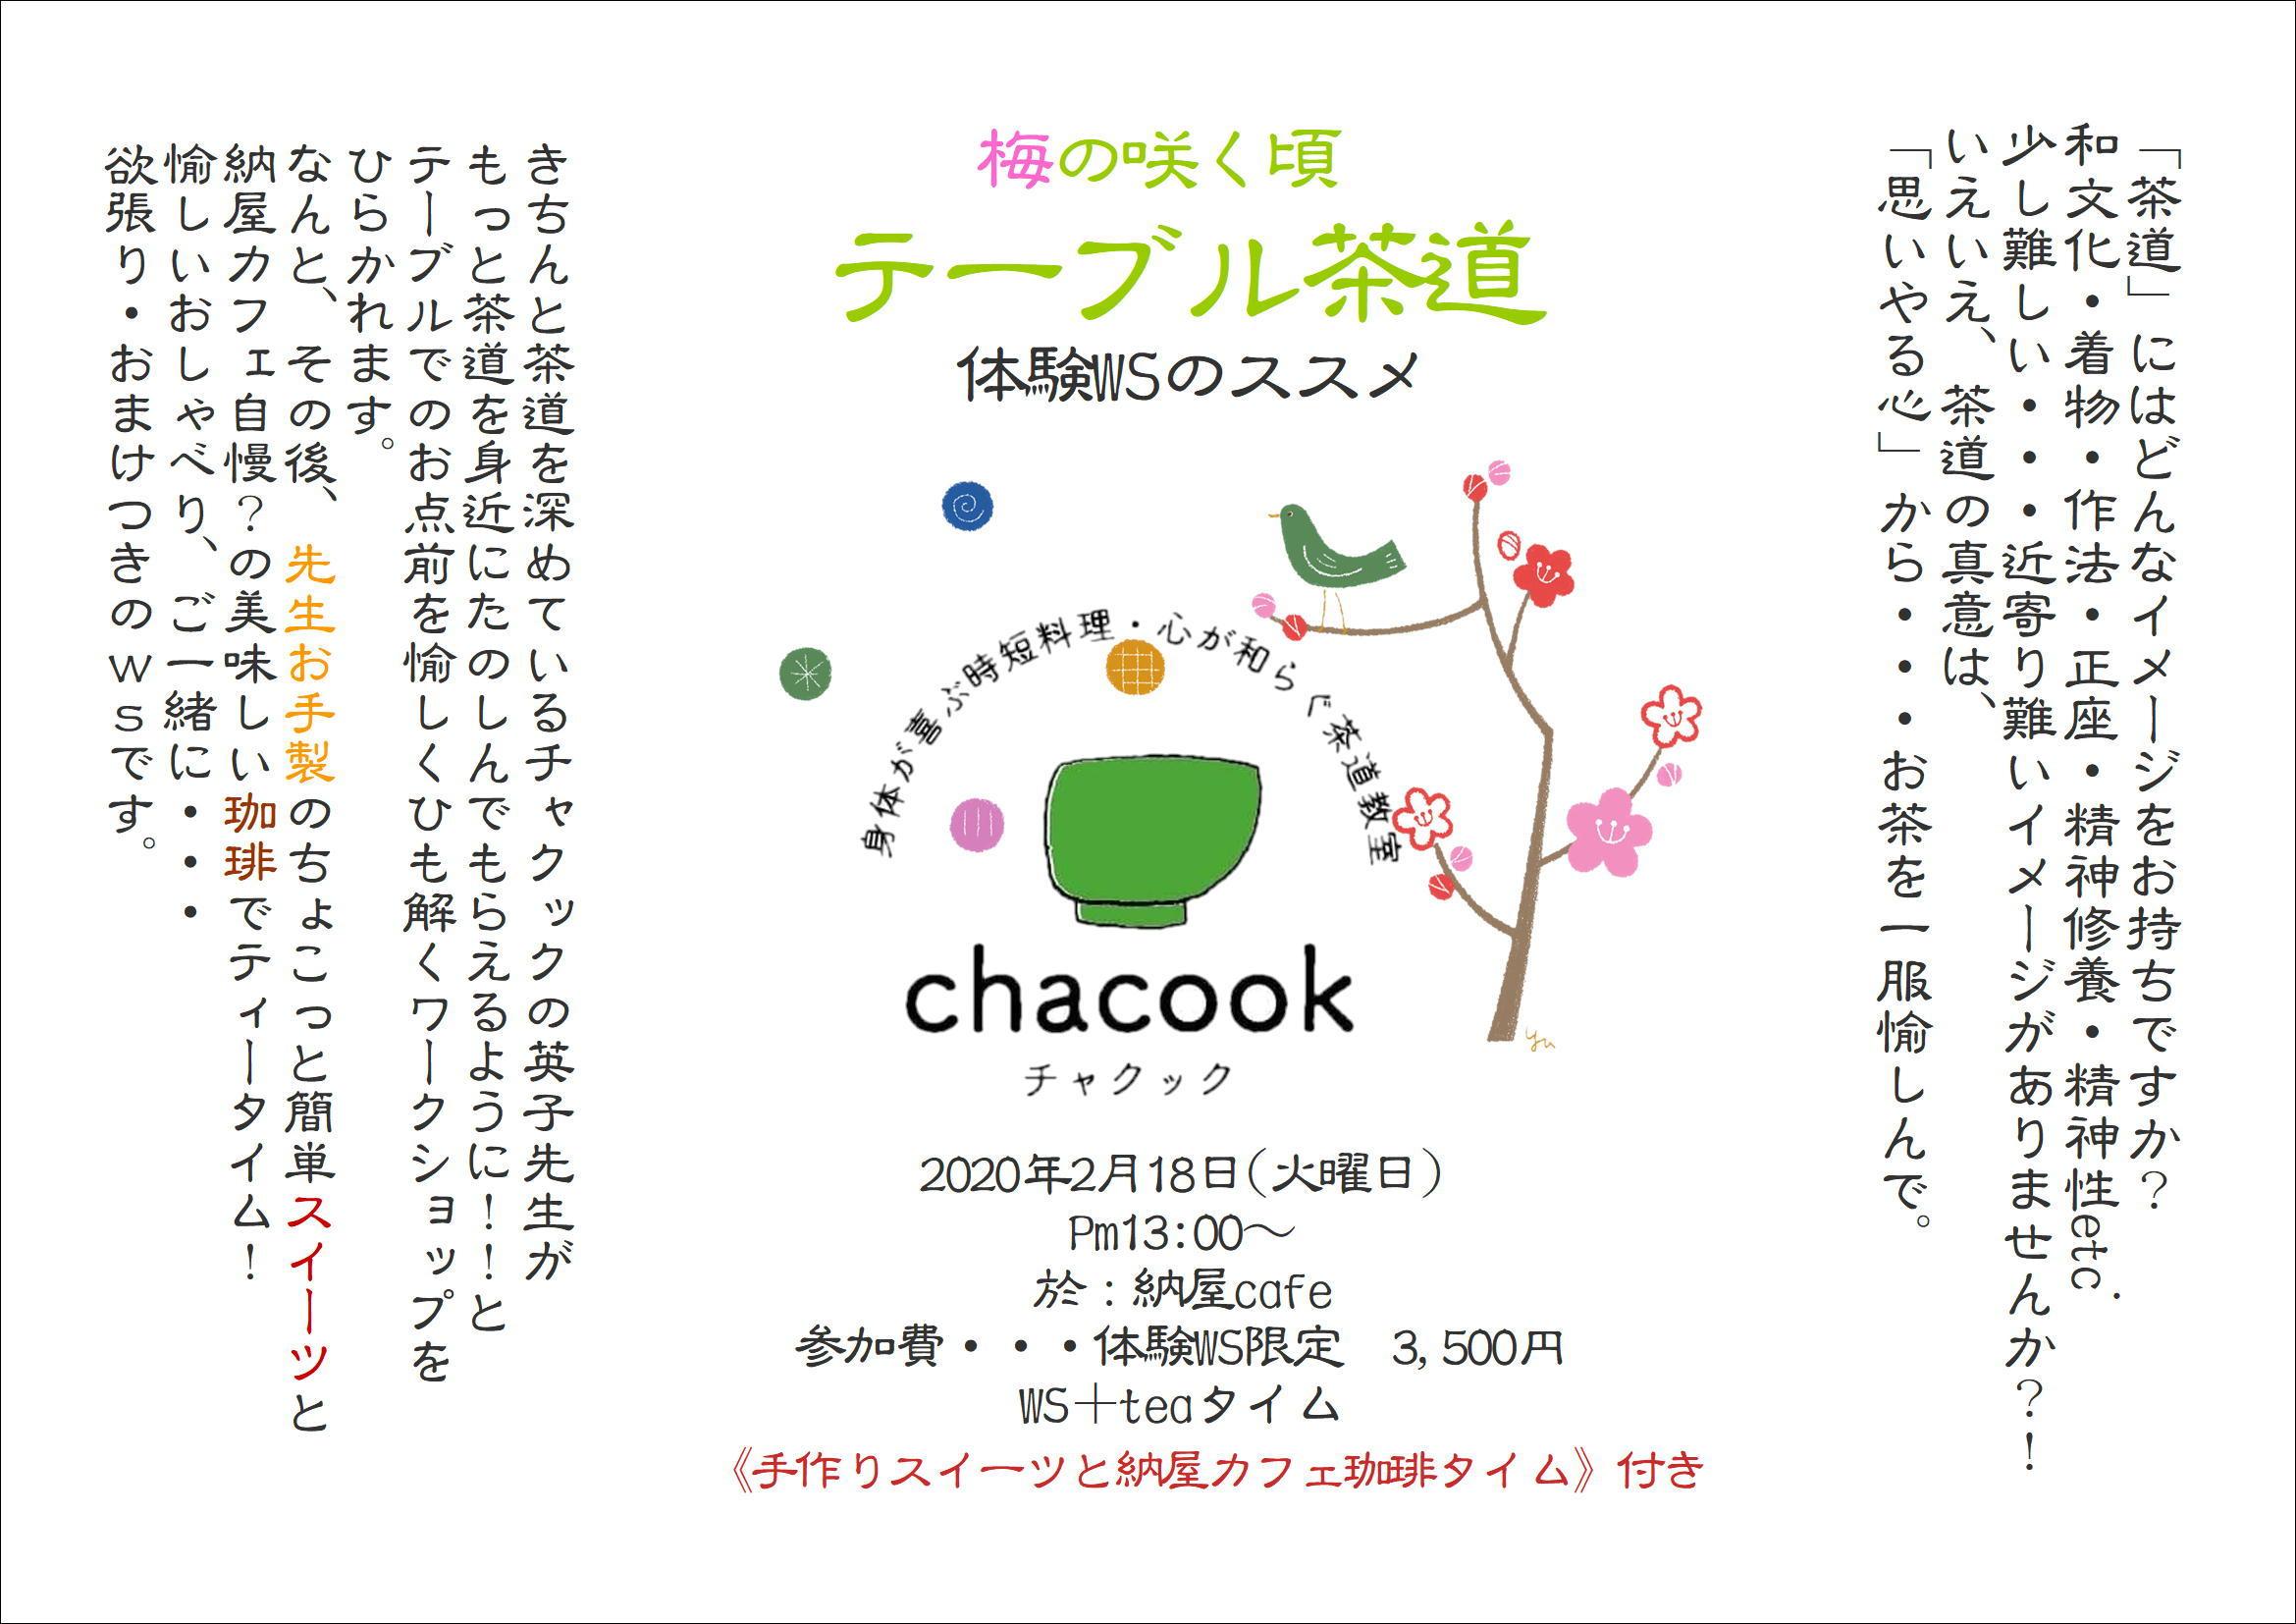 chacookさんのイベント「今月も、貸し切WS《テーブル茶道》あります!」編_e0359584_21251736.jpg